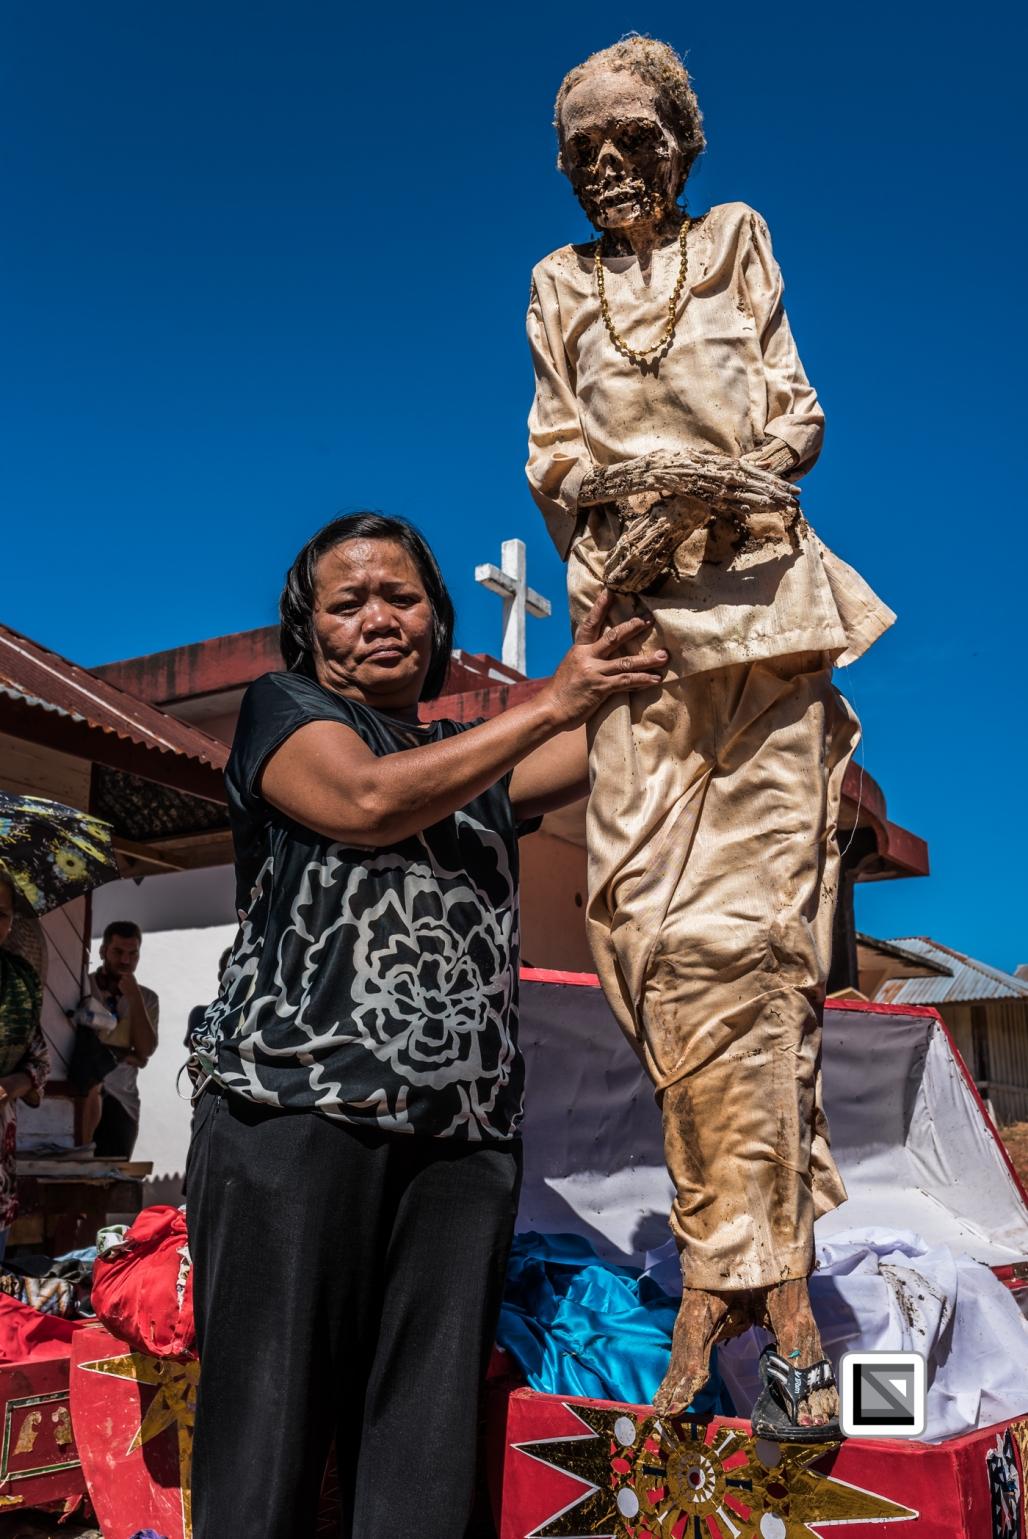 Indonesia-Toraja-Panggala_Manene-Nene_Marta_Duma_2008-18